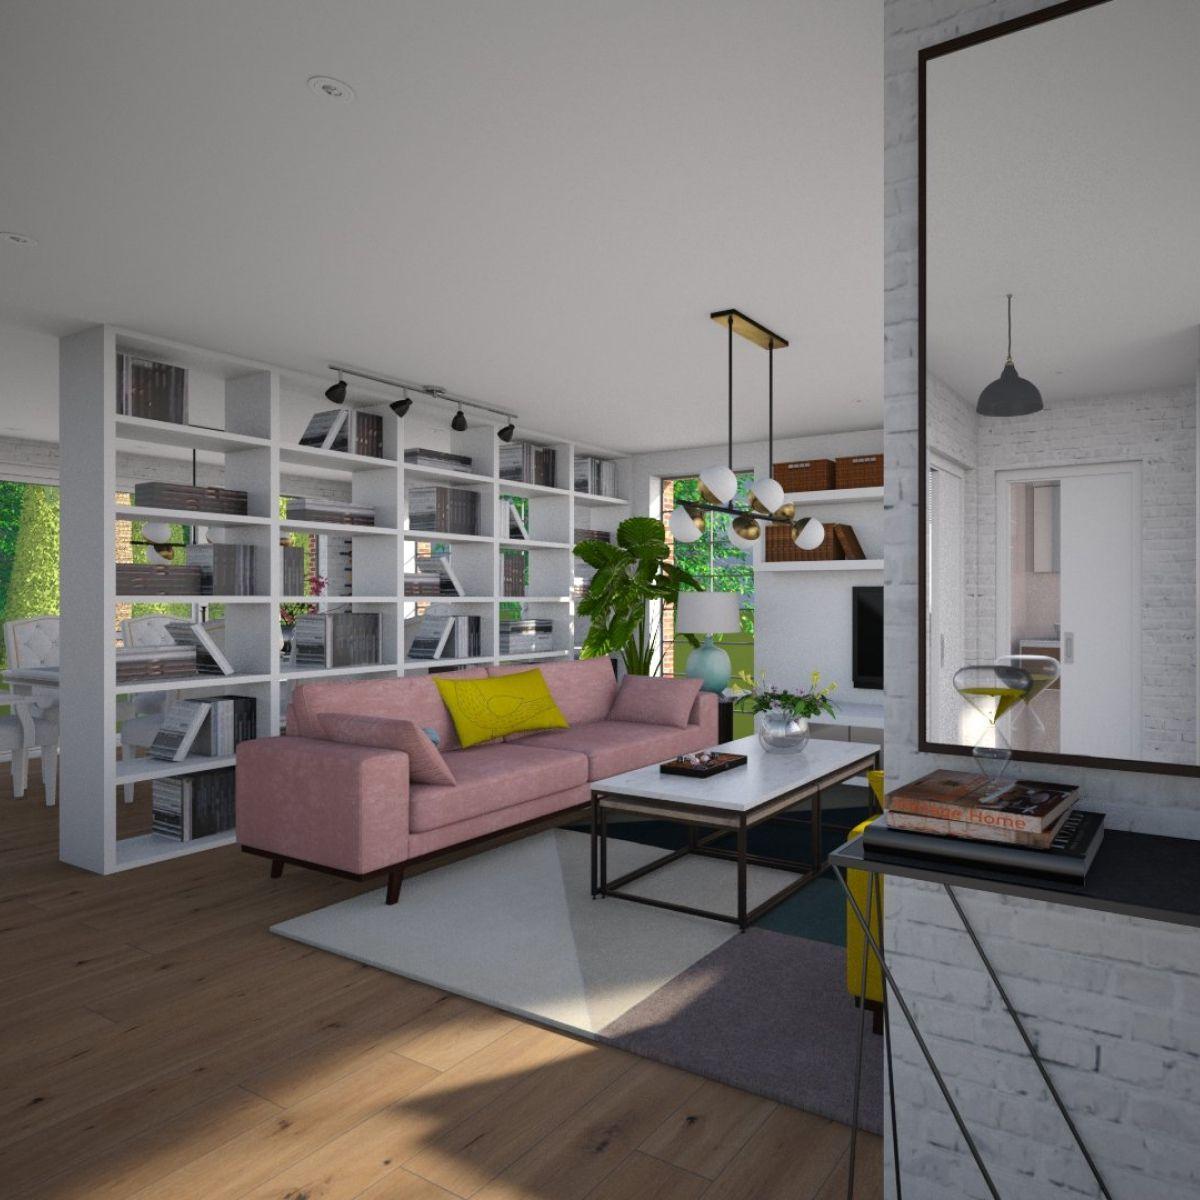 Living Room Layout Made On Floorplanner Com Livingroom Layout Design Your Home Interior Design Software